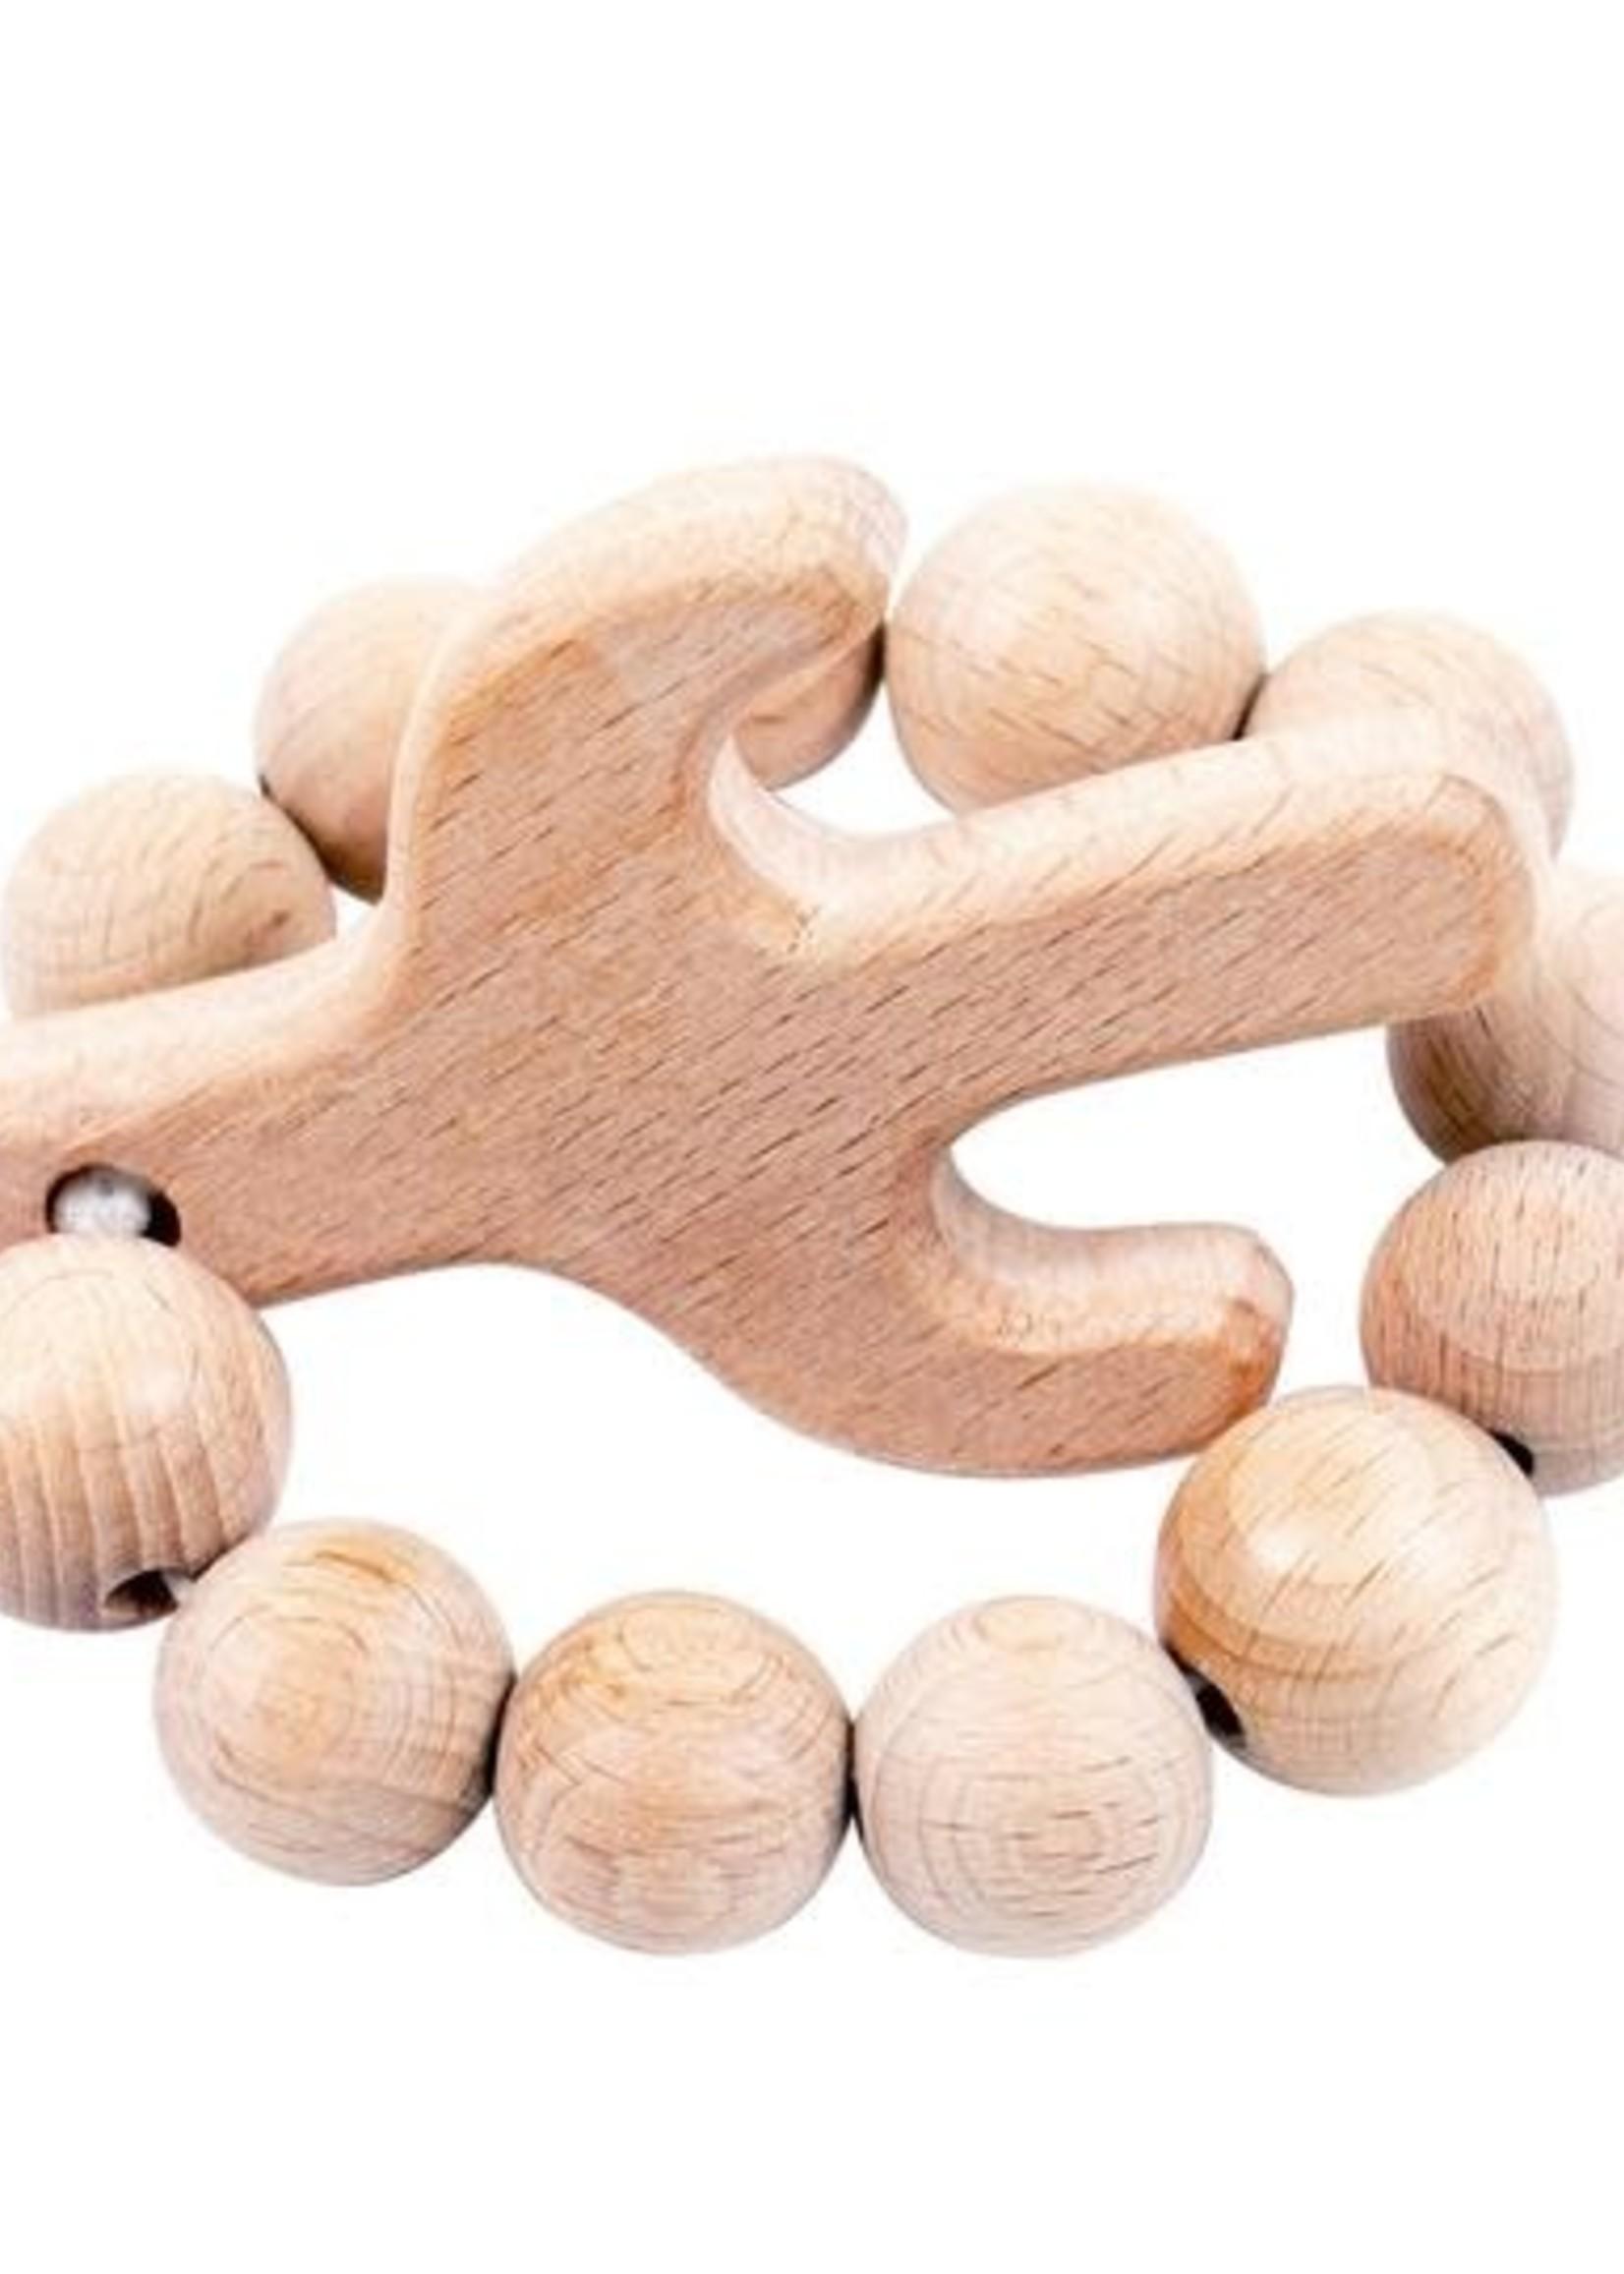 Bebe Au Lait Cactus Natural Wooden Teether